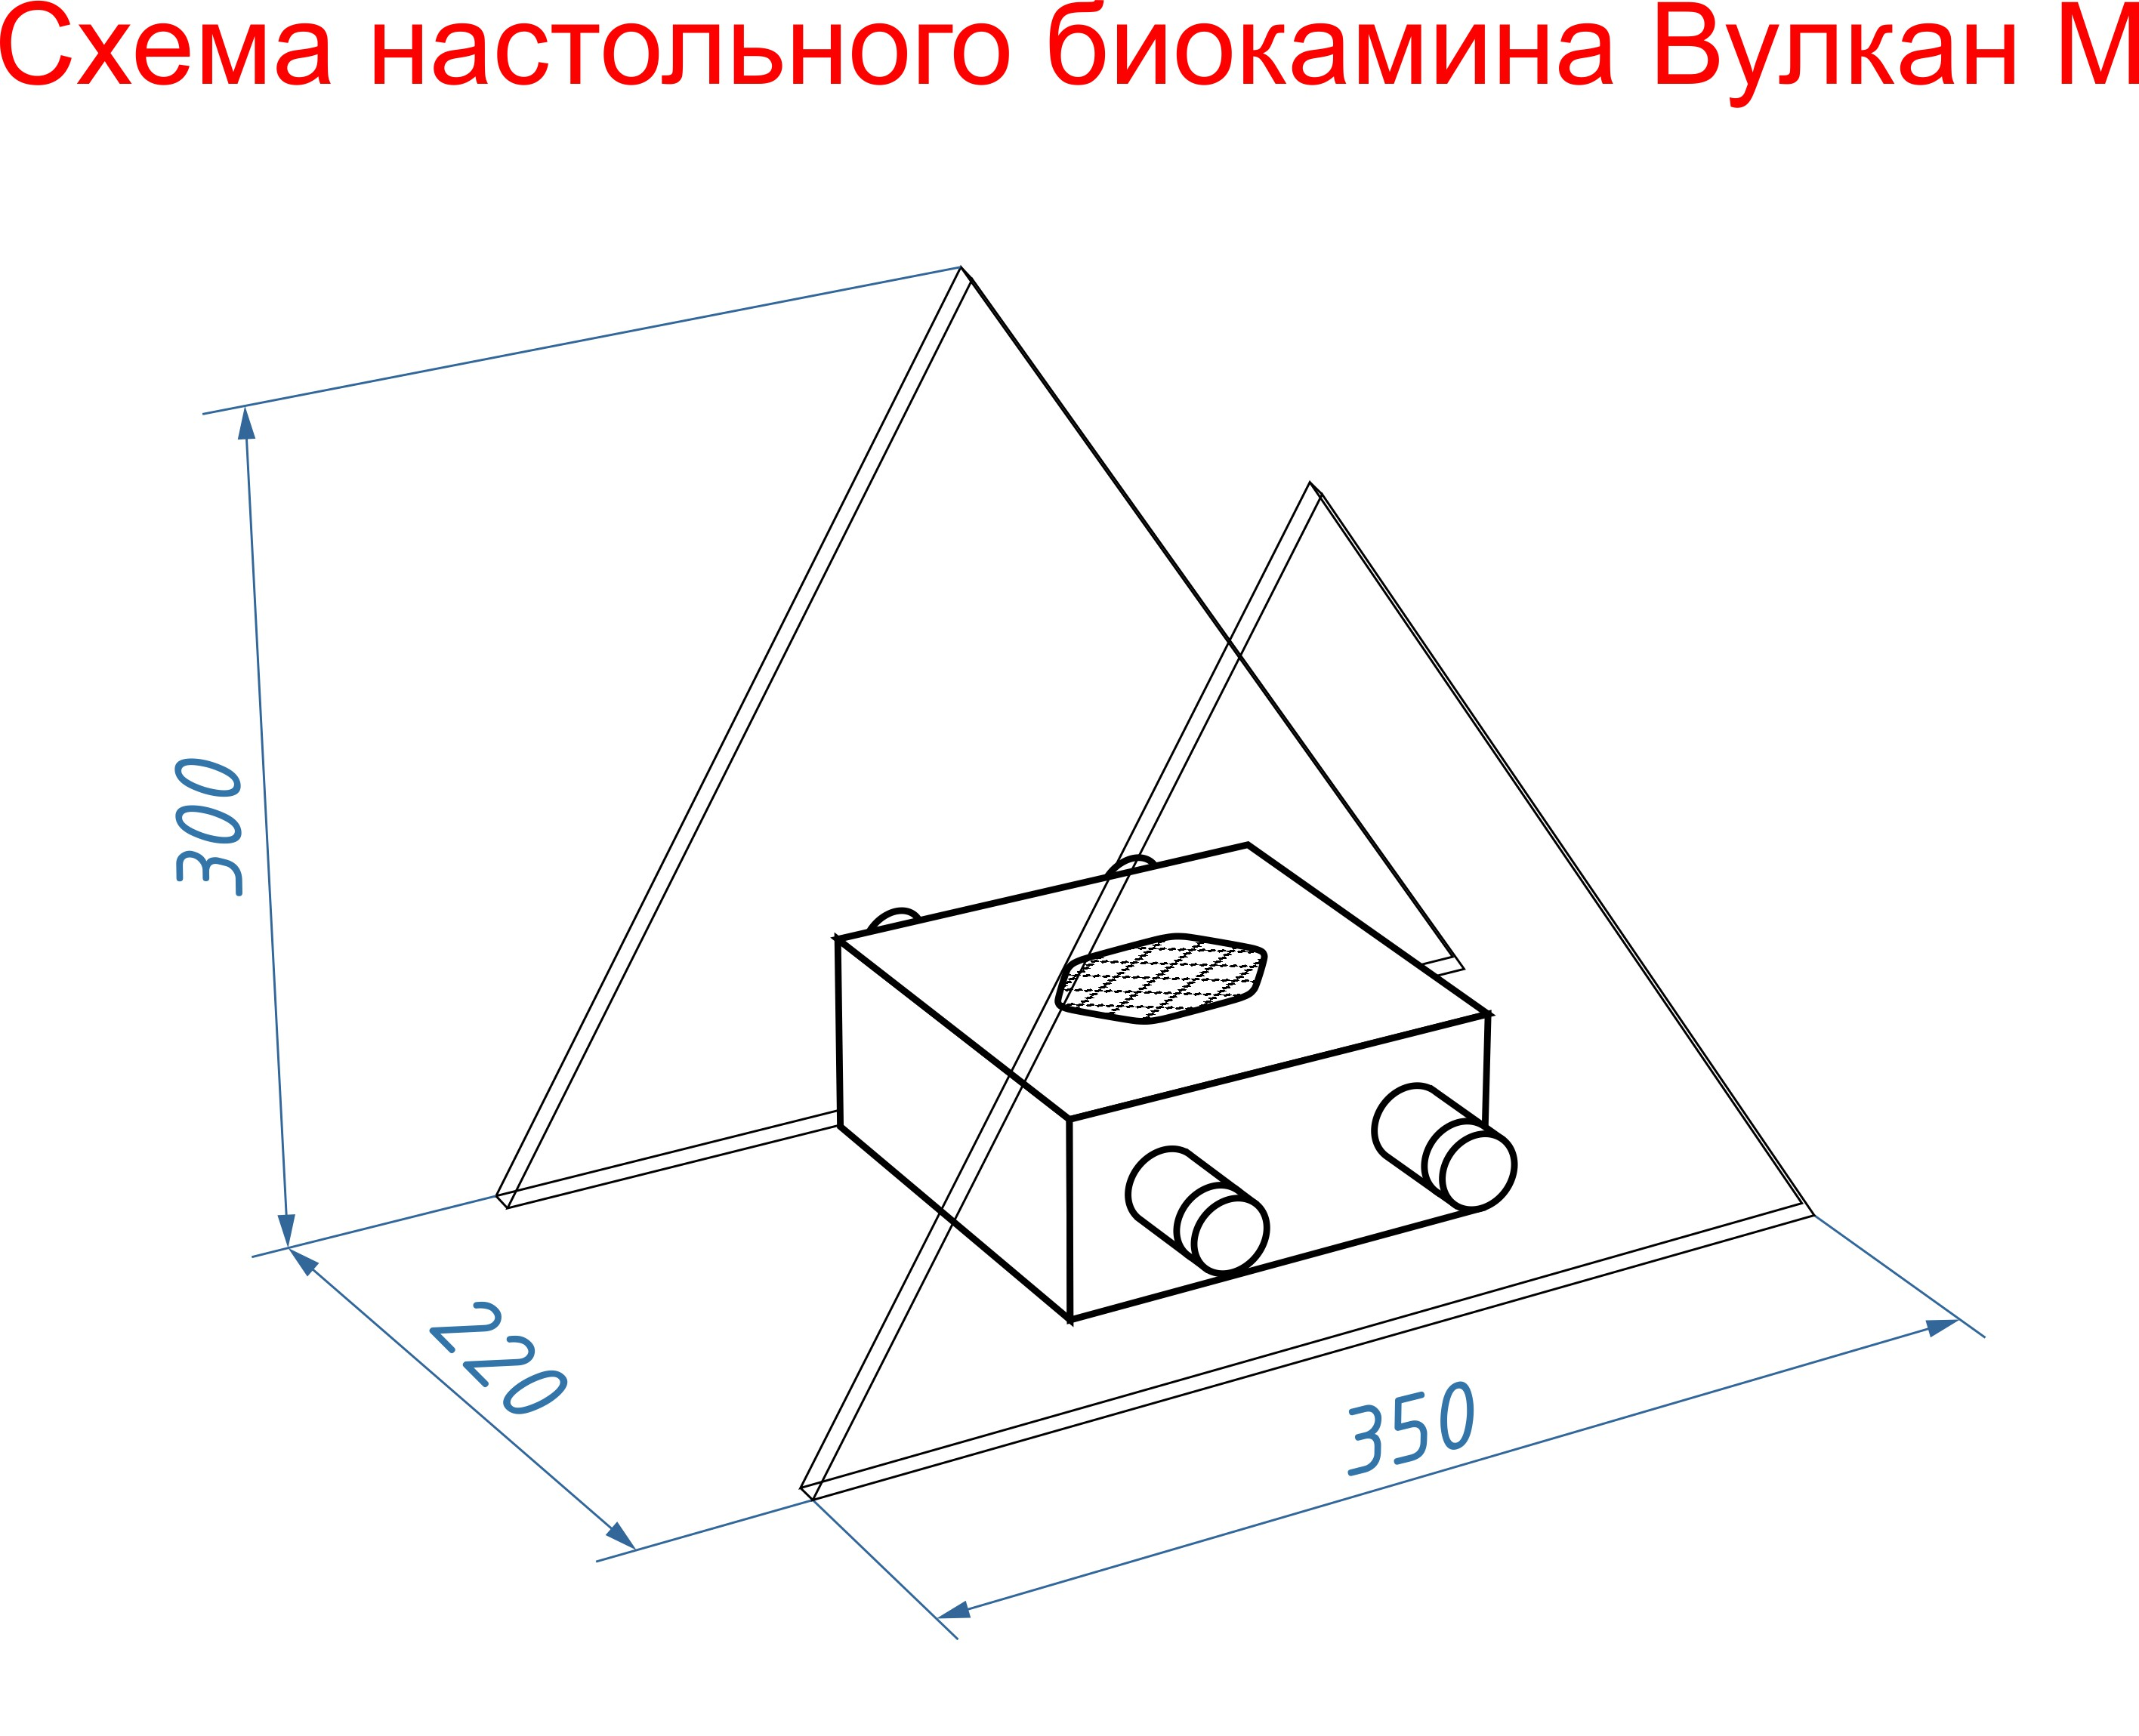 Biokamin-nastolnyy-Lux-Fire-Vulkan-M-chernyy_004.jpg